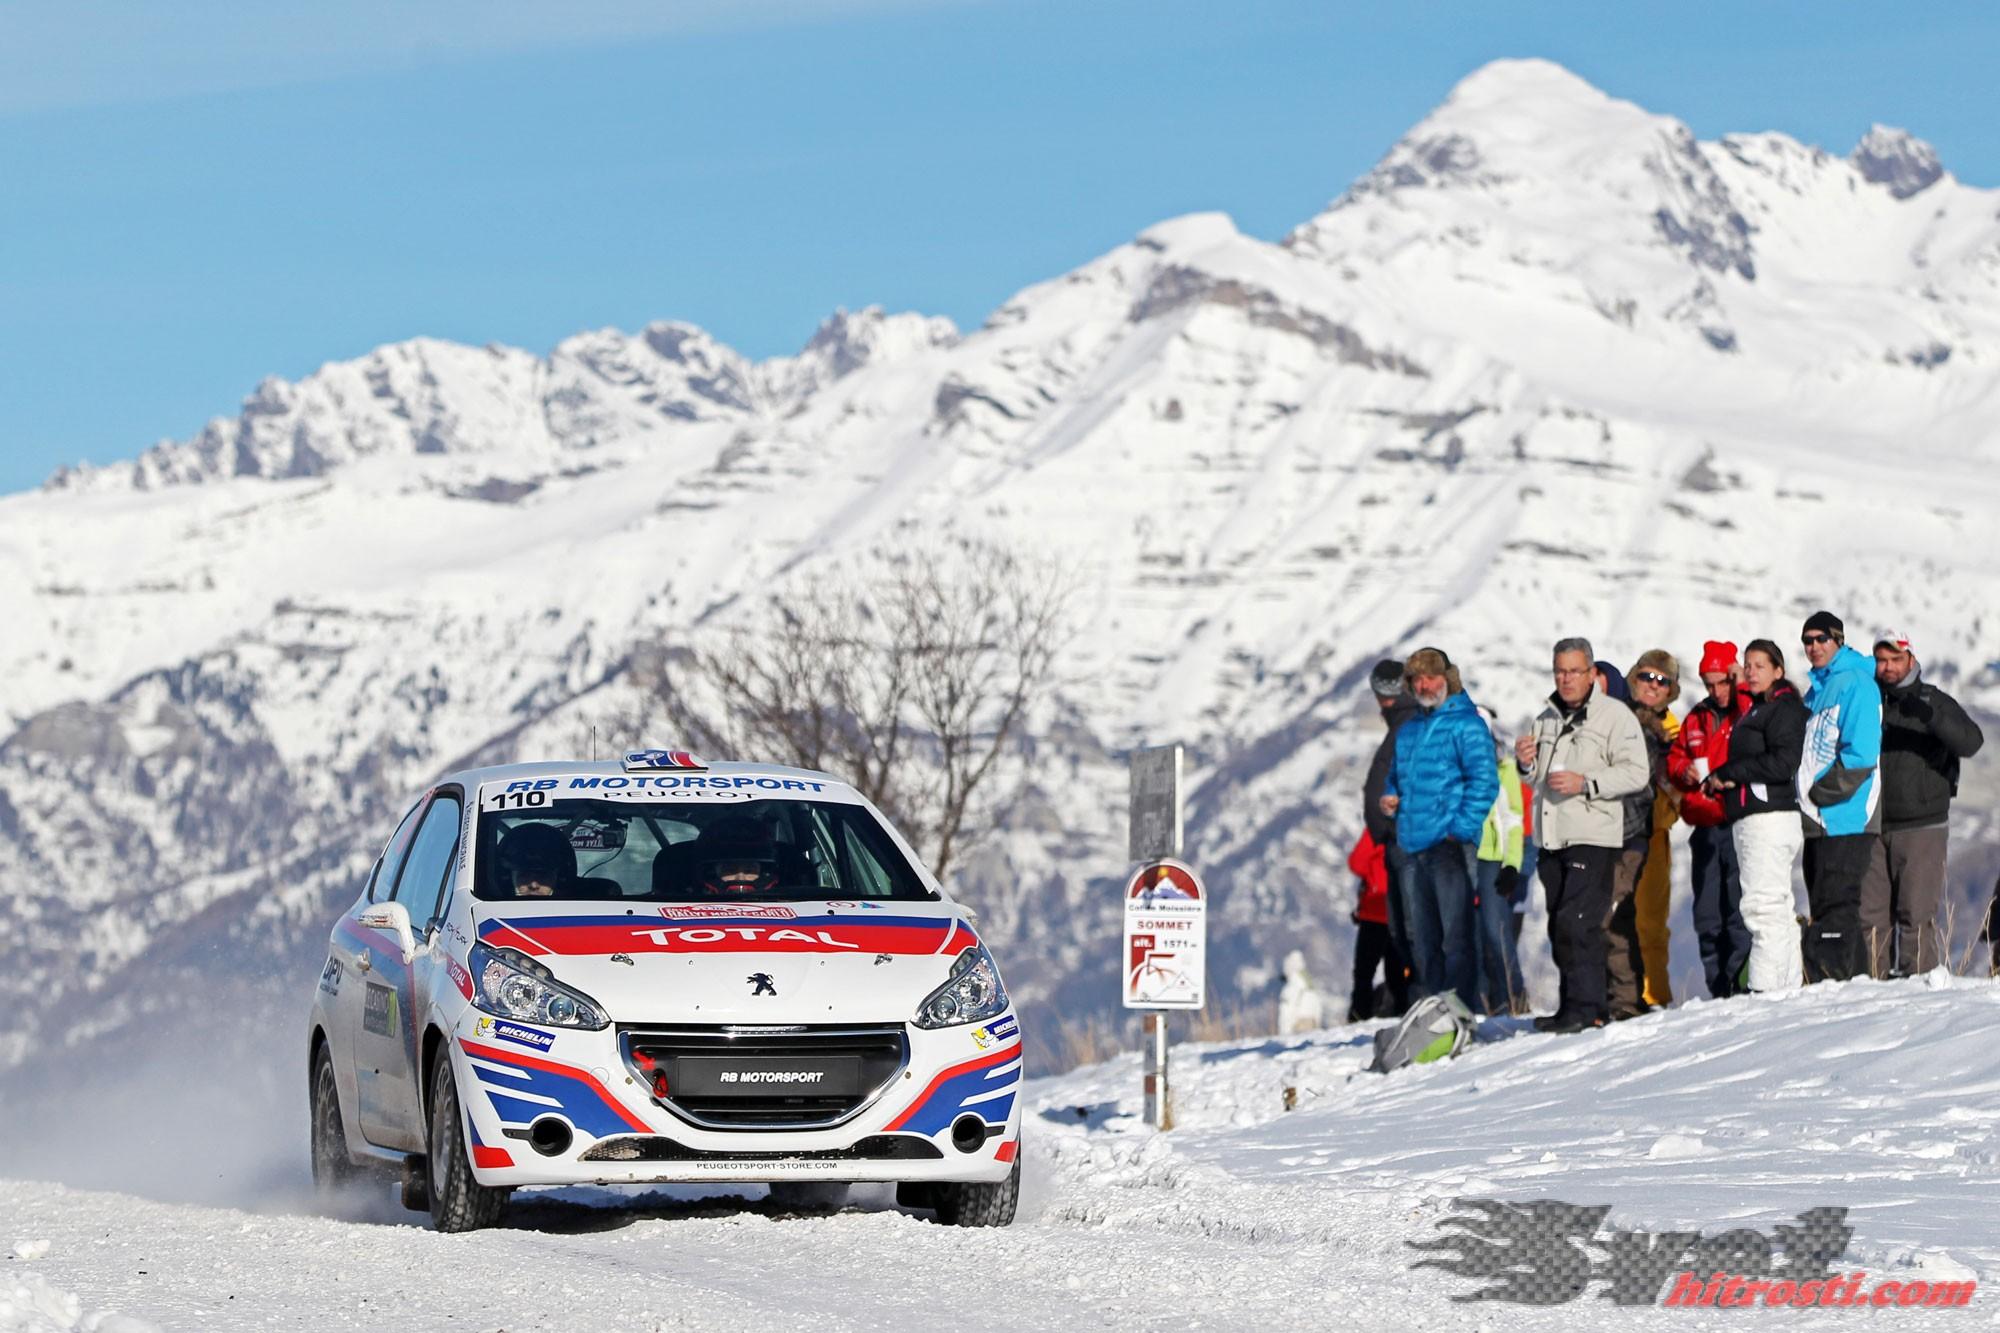 Zabavni trenutki rallyja Monte-Carlo